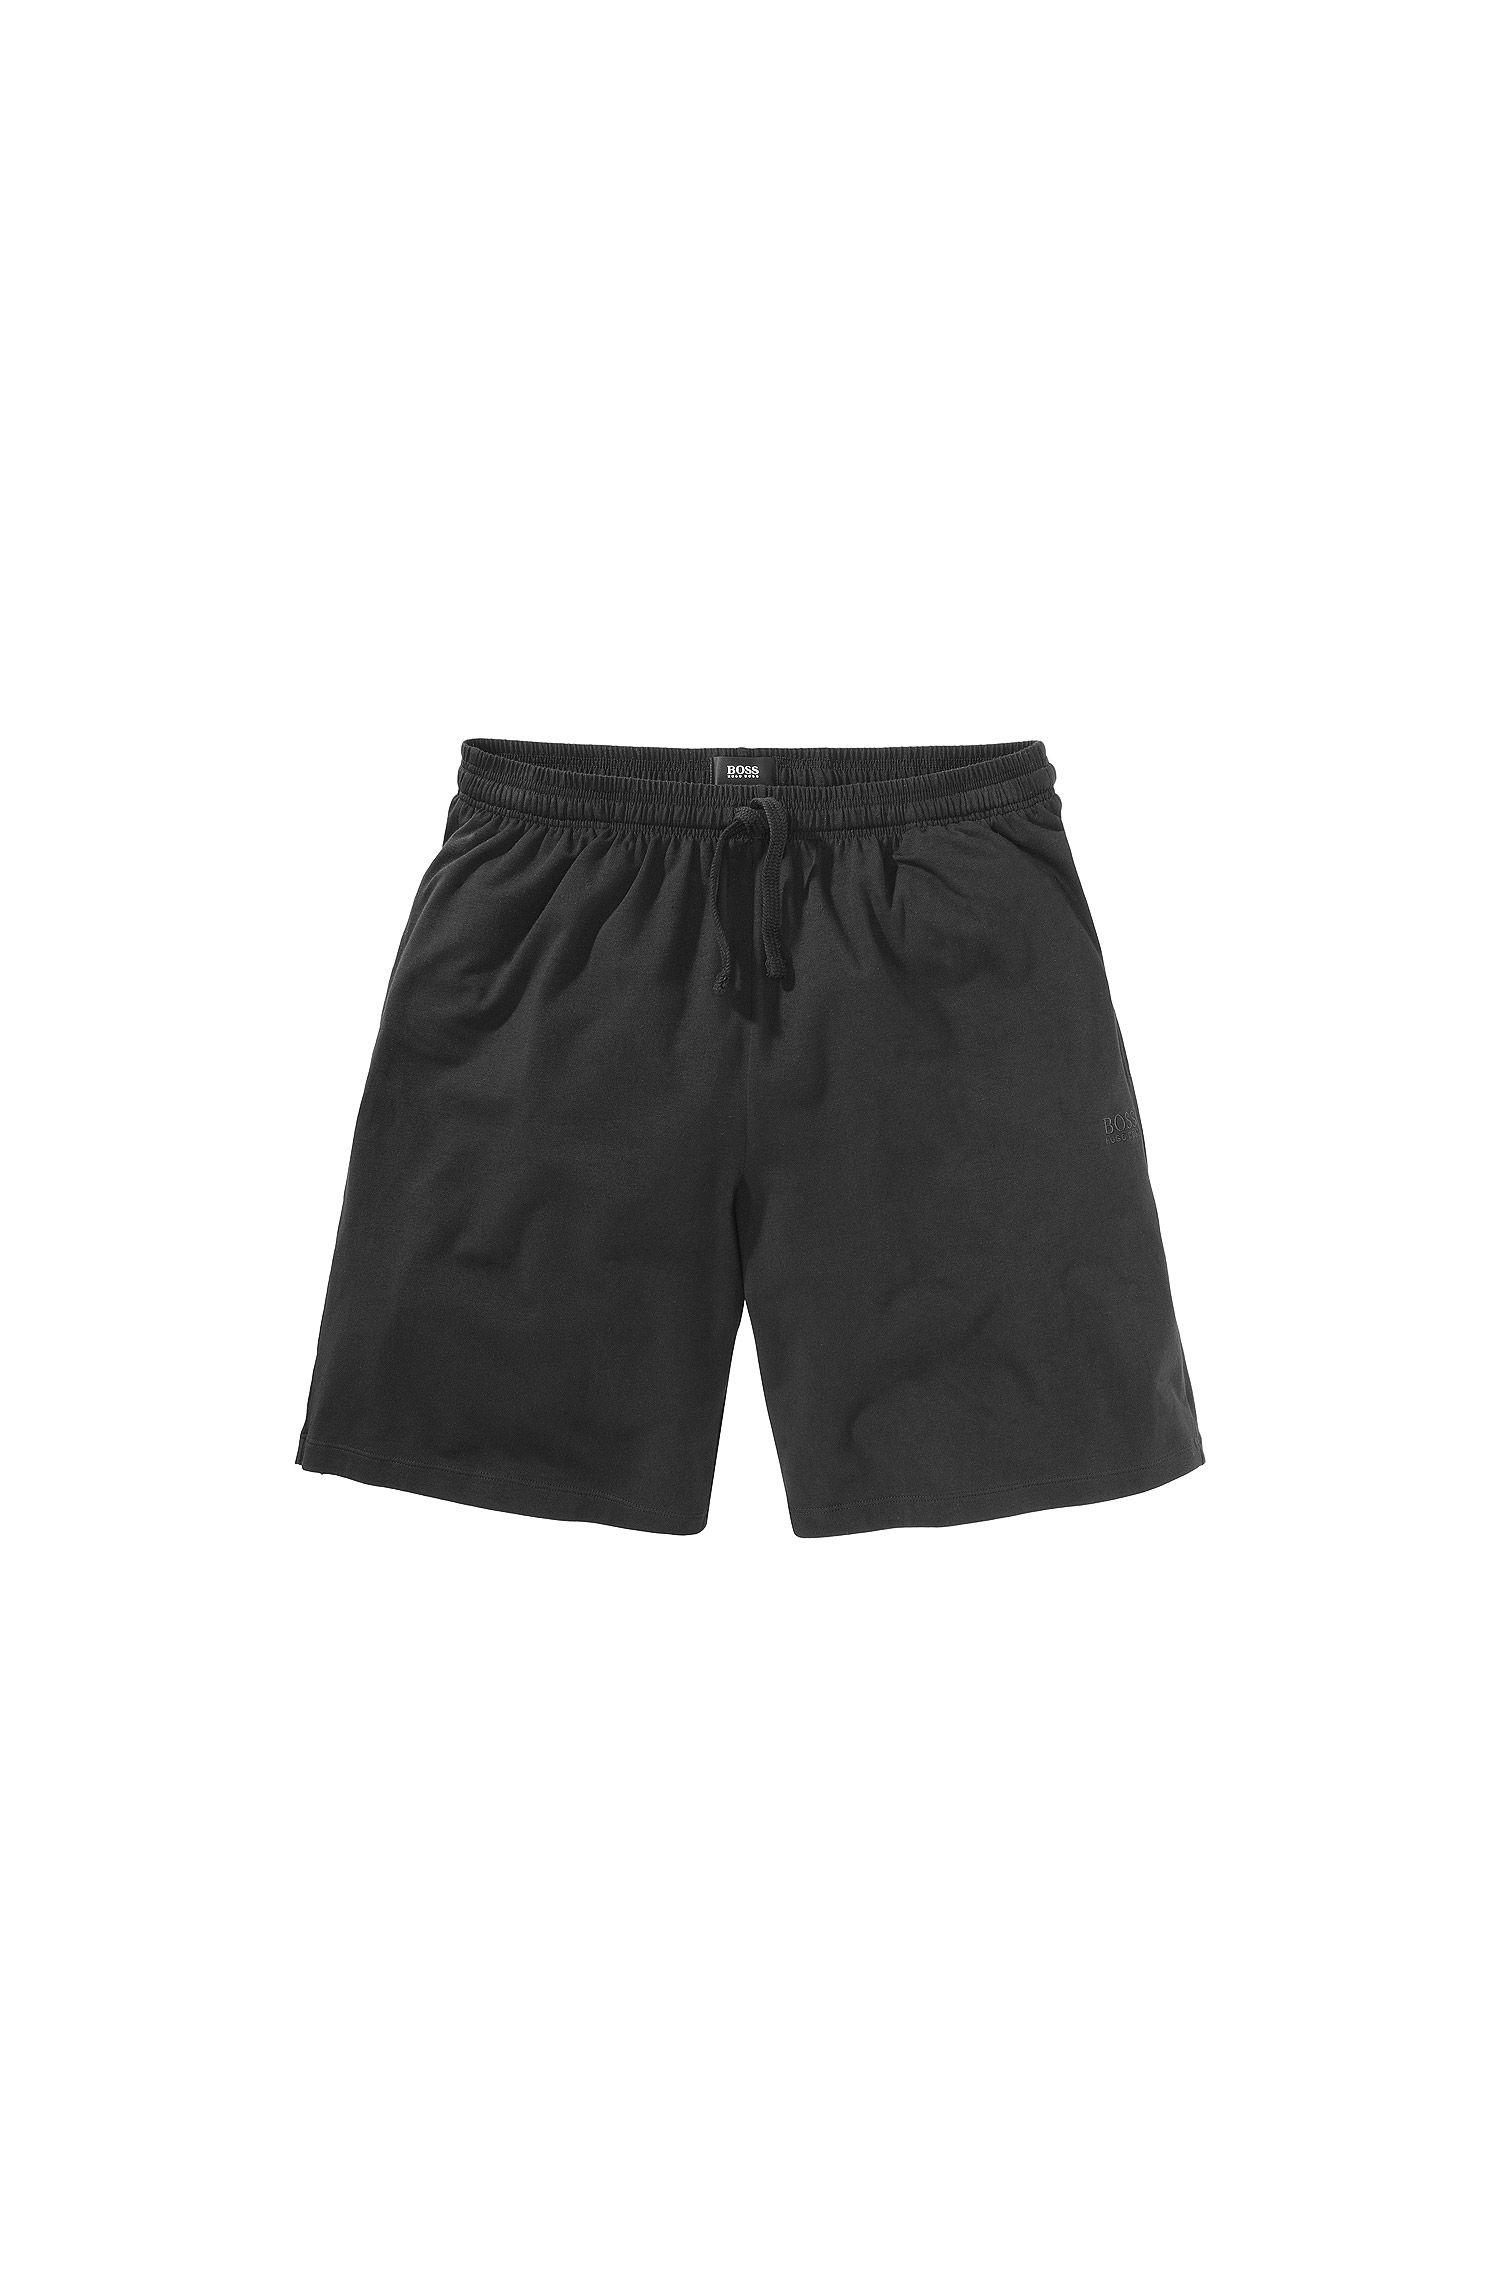 Shorts ´Short Pant CW BM`, Baumwollkomposition